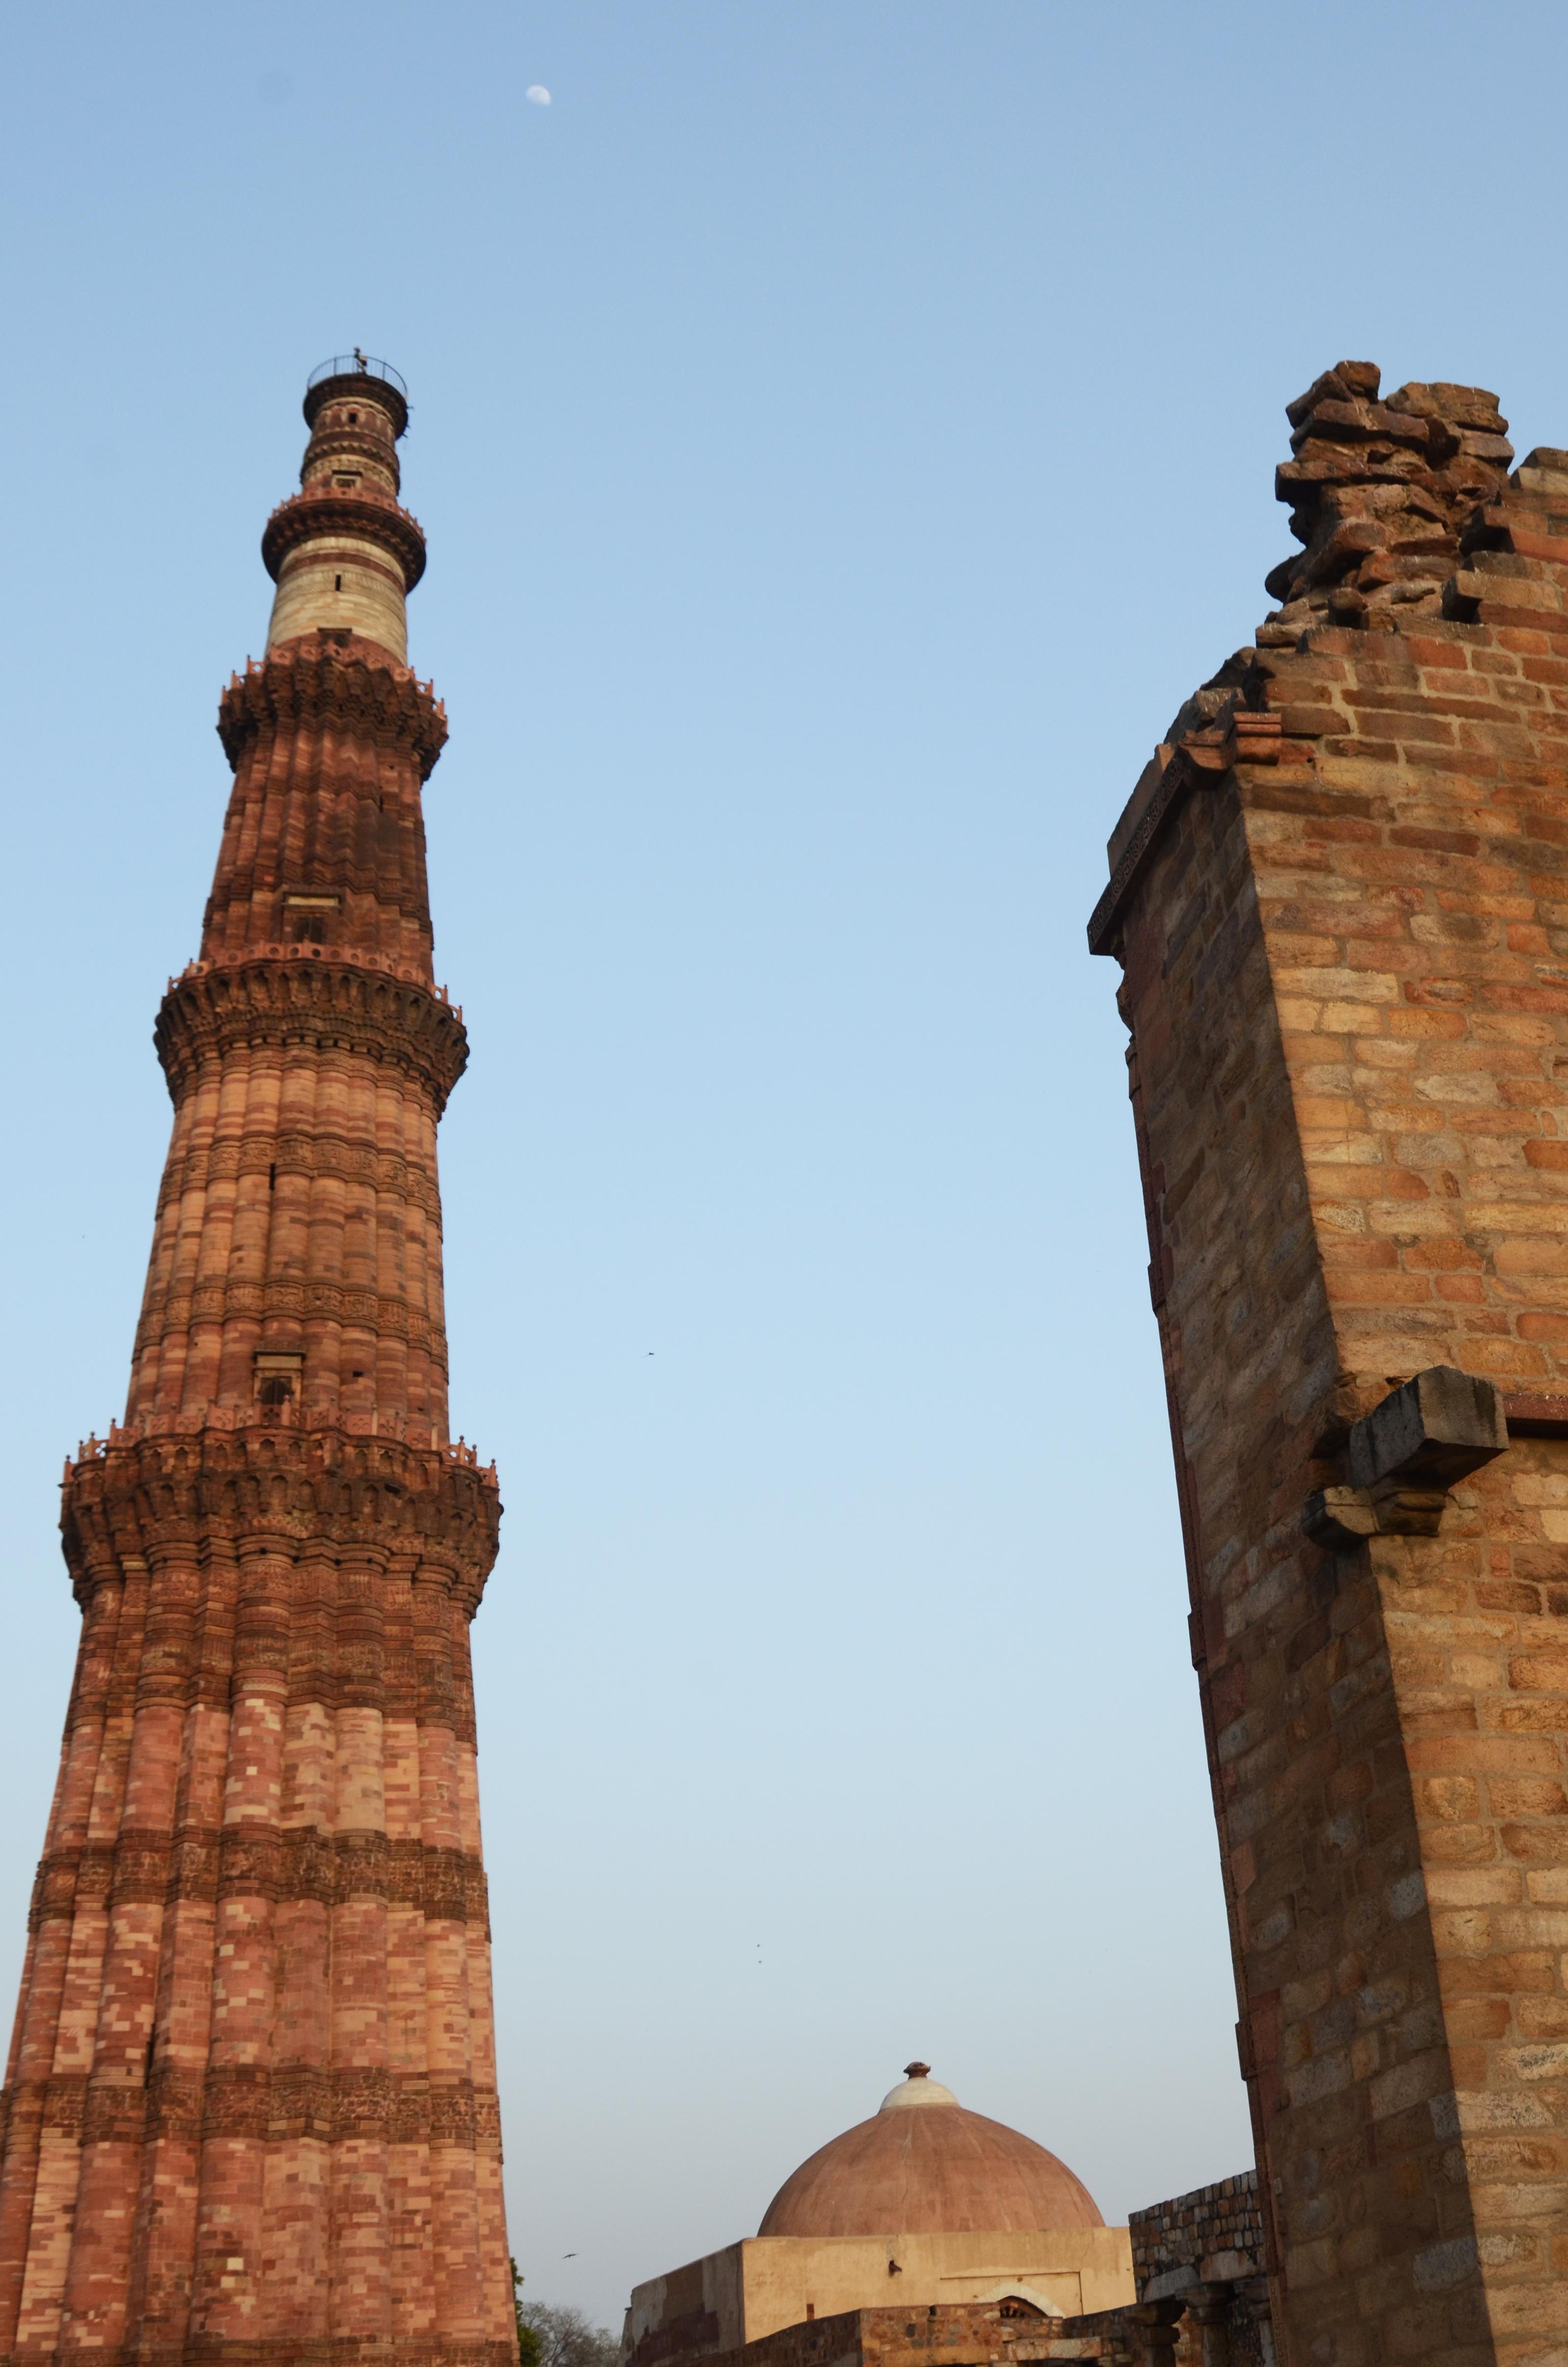 Gutb Minar